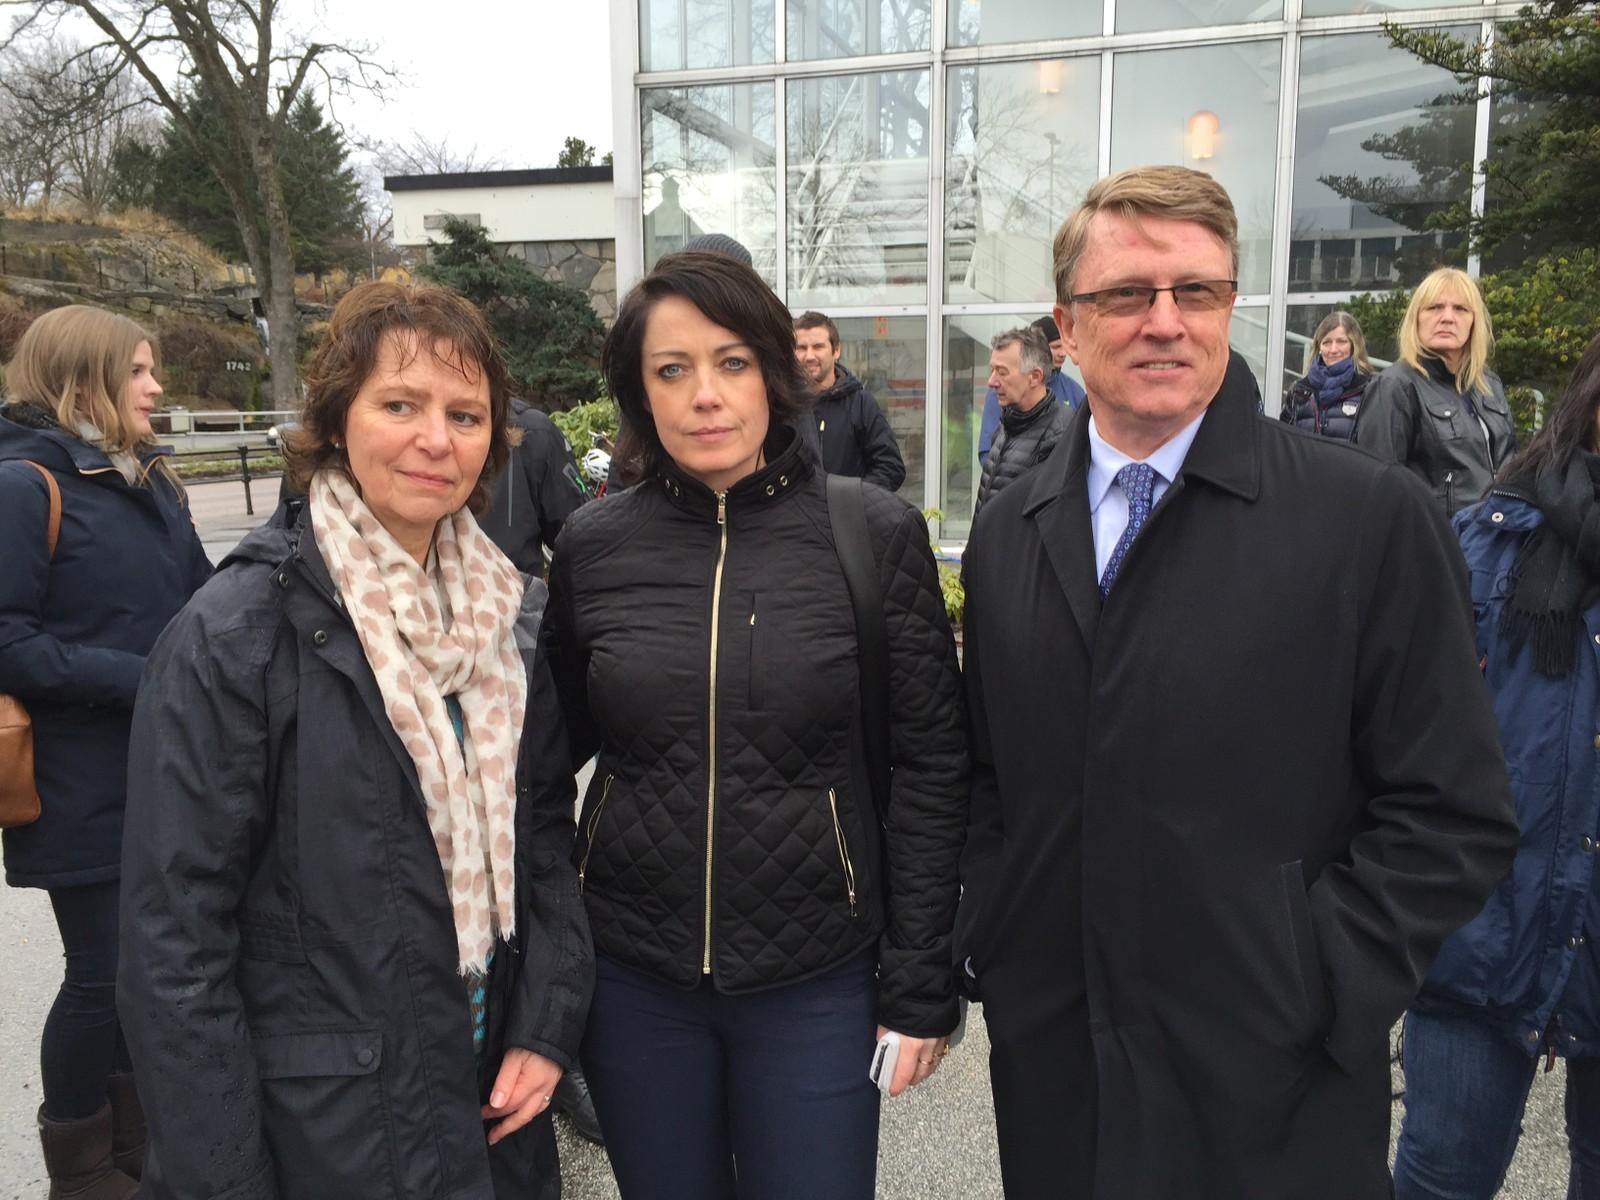 Unni Garberg, hovedtillitsvalgt ved Ello sammen med stortingsrepresentantene Else-May Botten (Ap) og Oskar Grimstad (Frp)